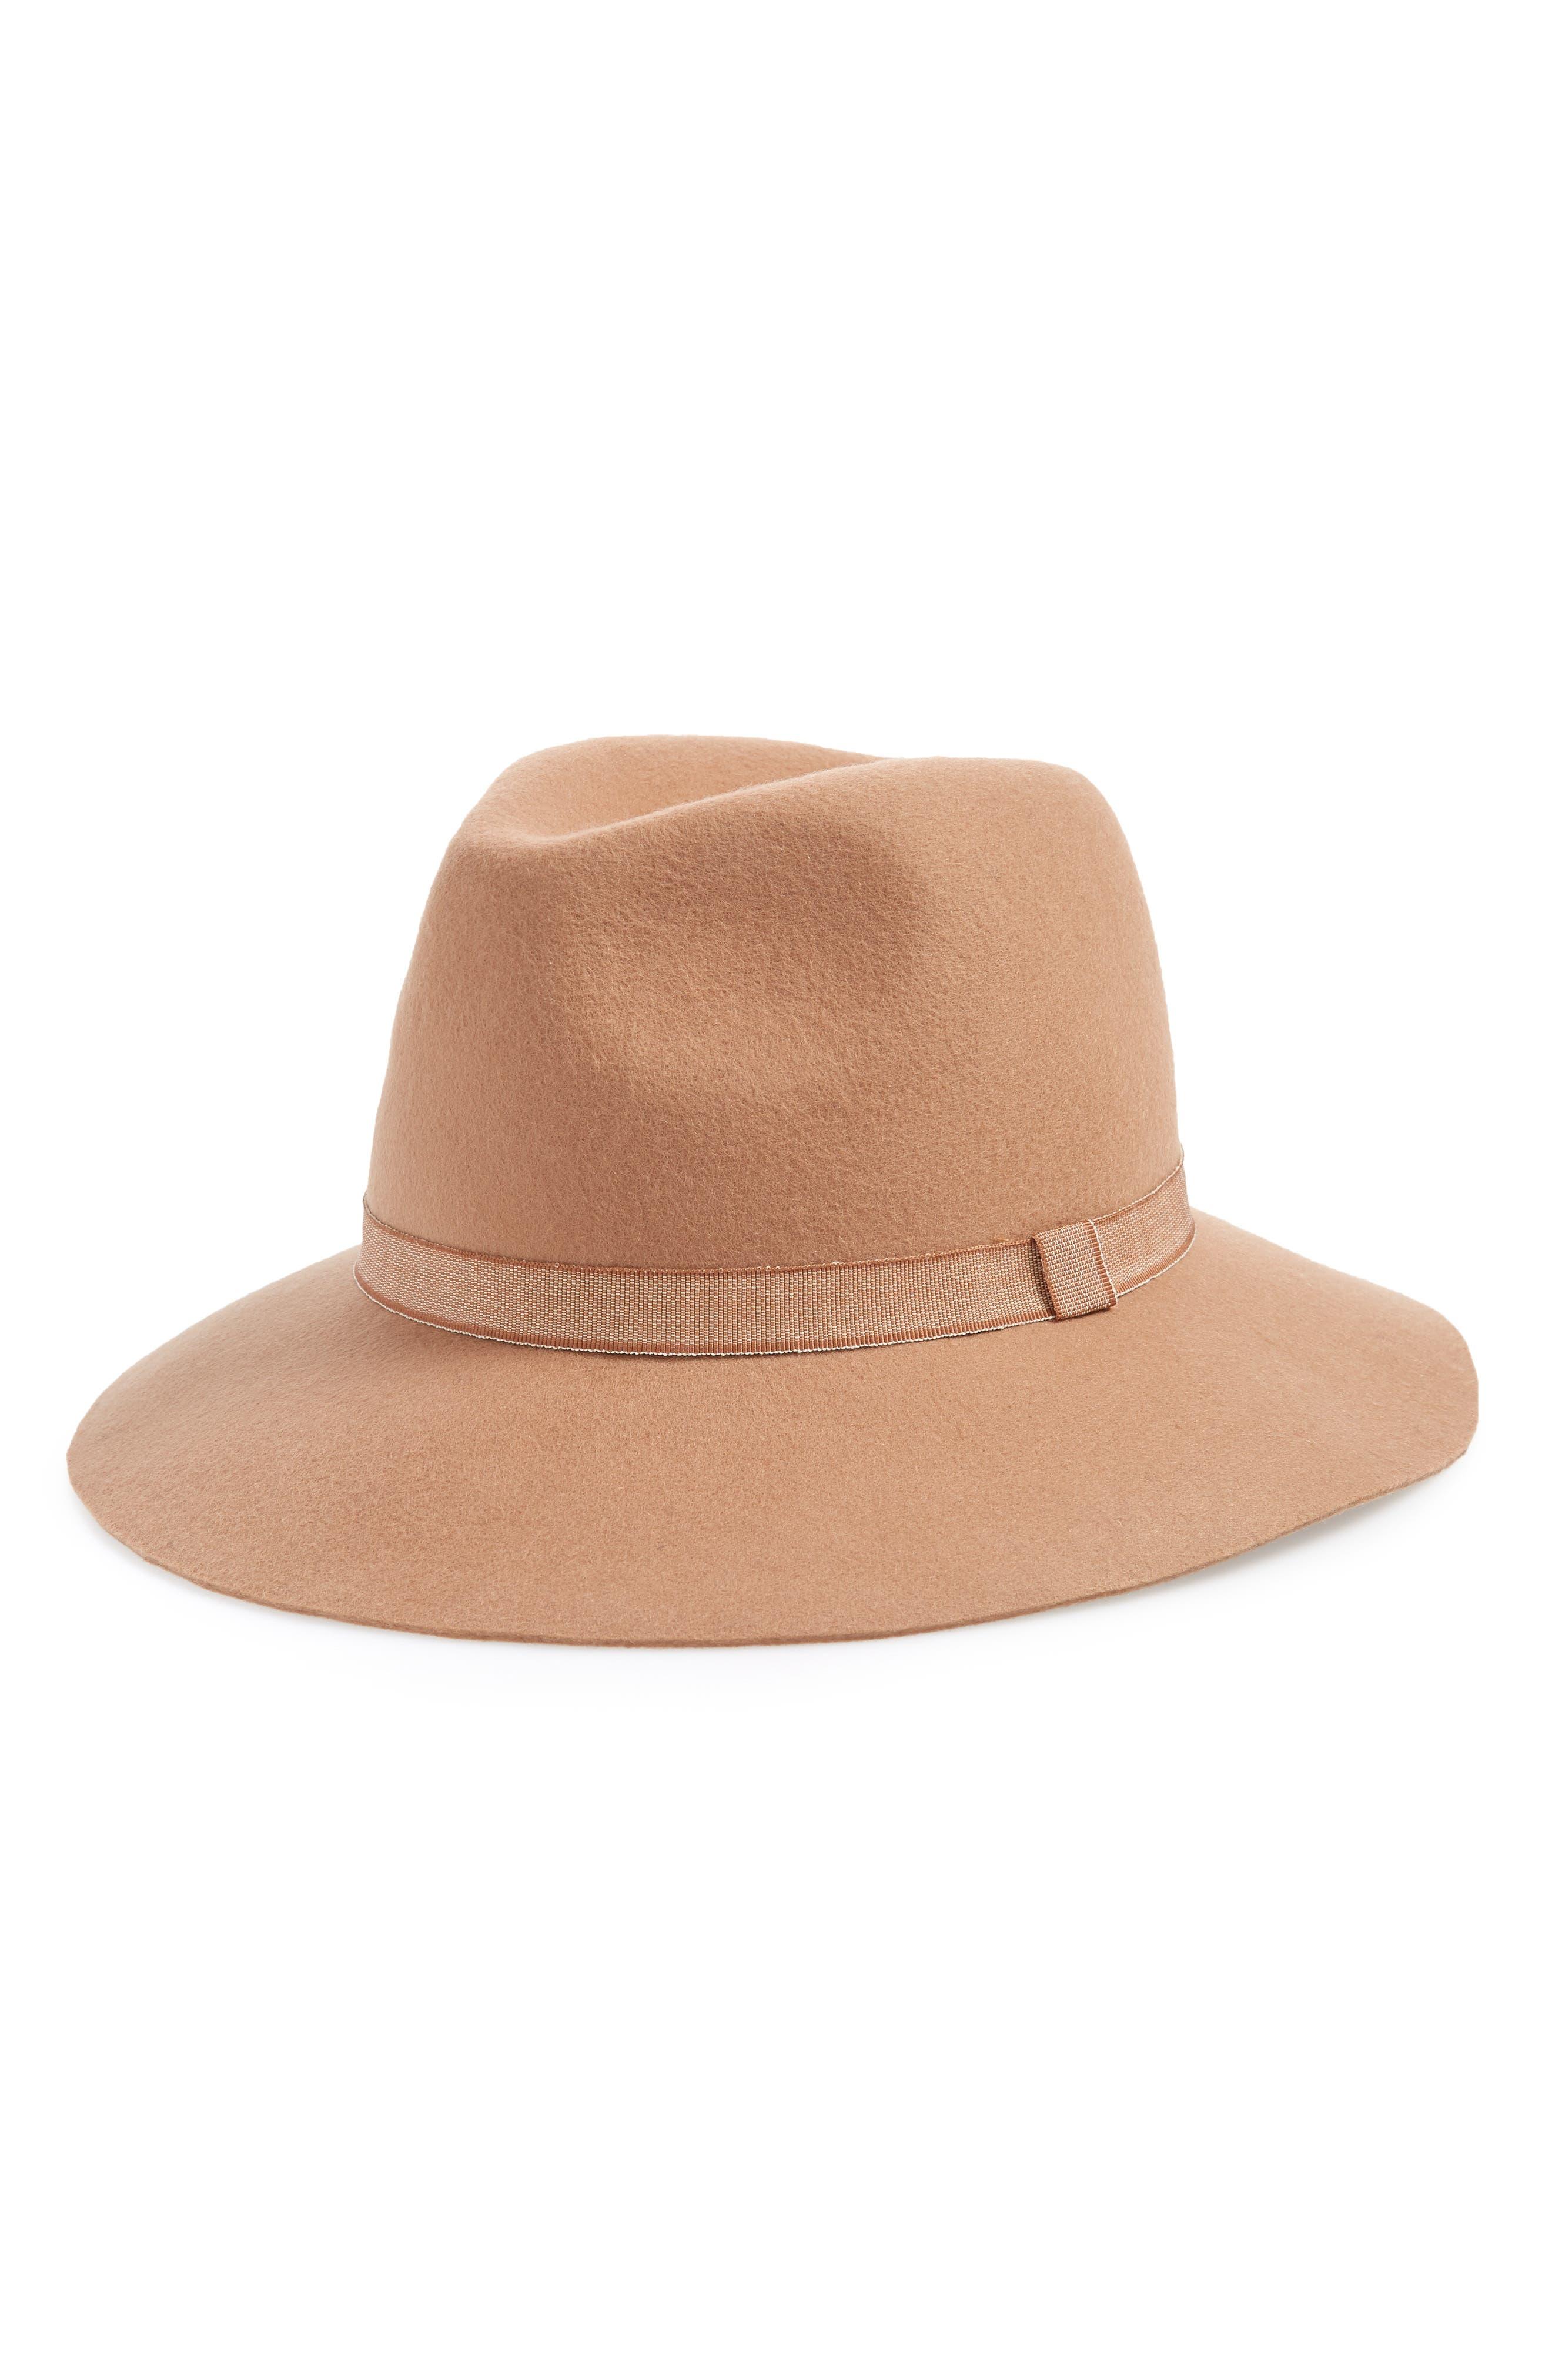 Felt Panama Hat,                         Main,                         color, CAMEL